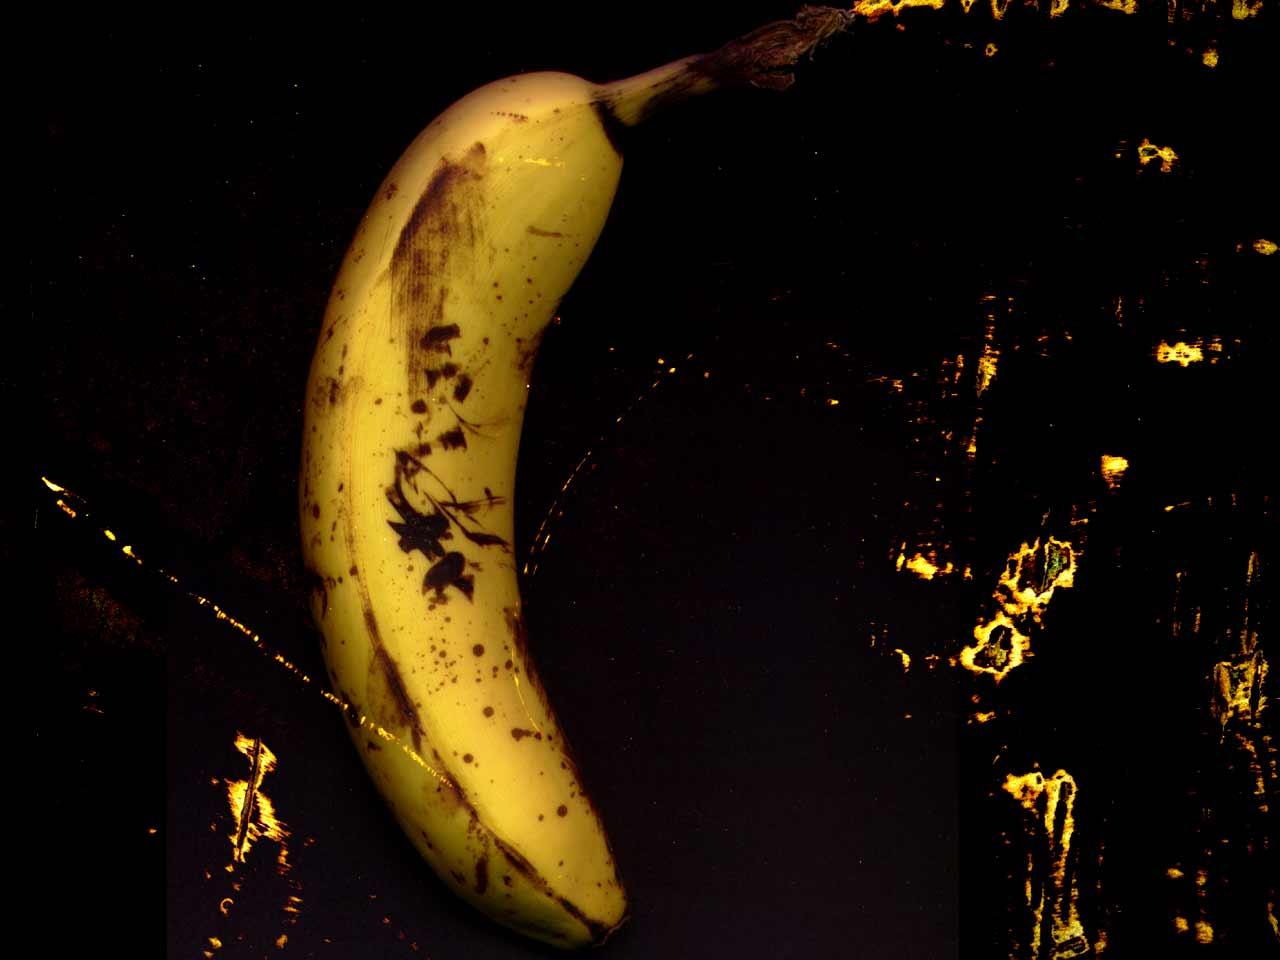 банан спелый на черном фоне, black banana wallpaper, фото